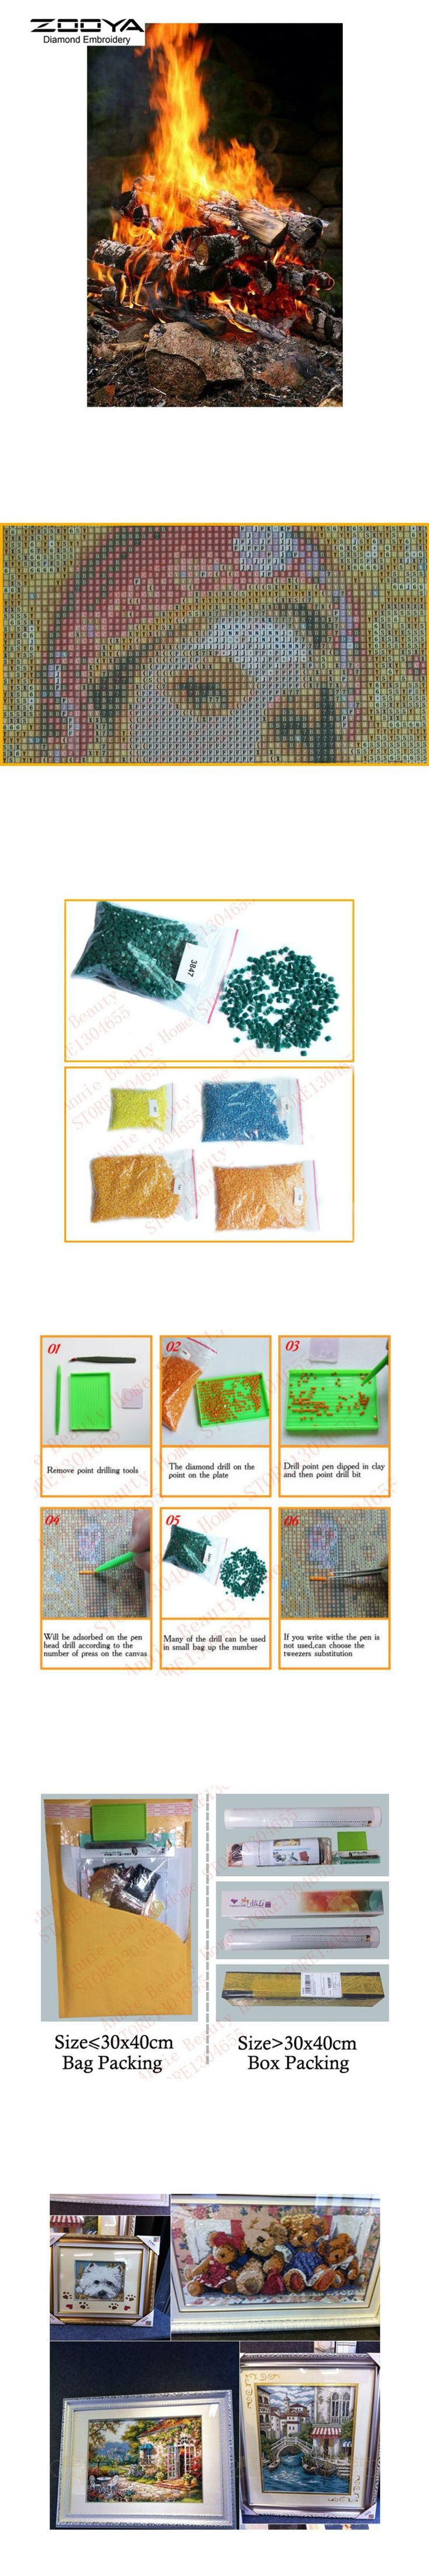 5D DIY Diamond Painting Warm Fire Crystal Diamond Painting Cross Stitch Firewood Combustion Needlework Home Decorative BJ777 $8.27